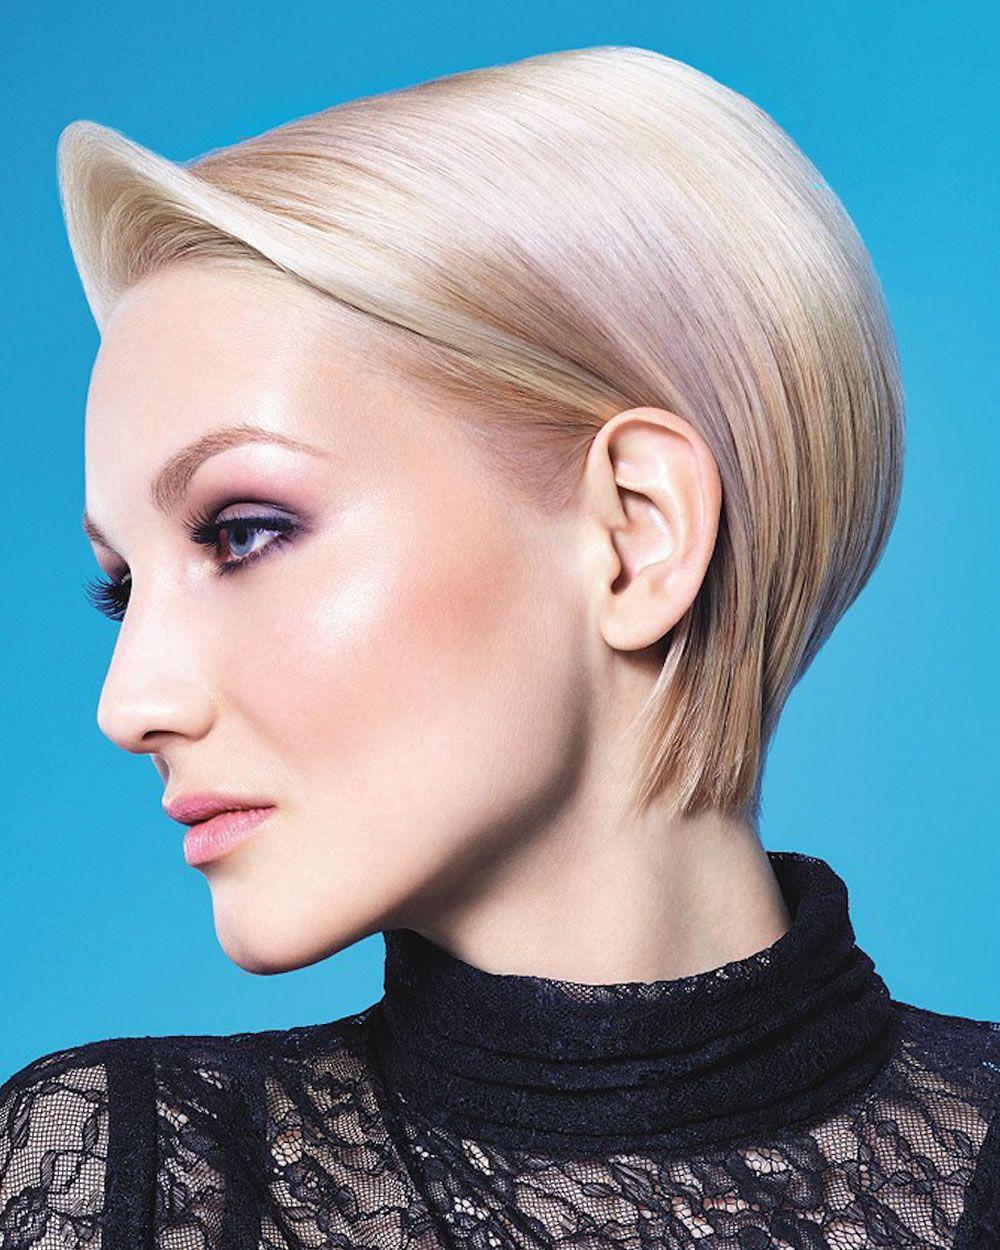 Luxus Russische Frisuren Frauen | Top Frisur Ideen Passen